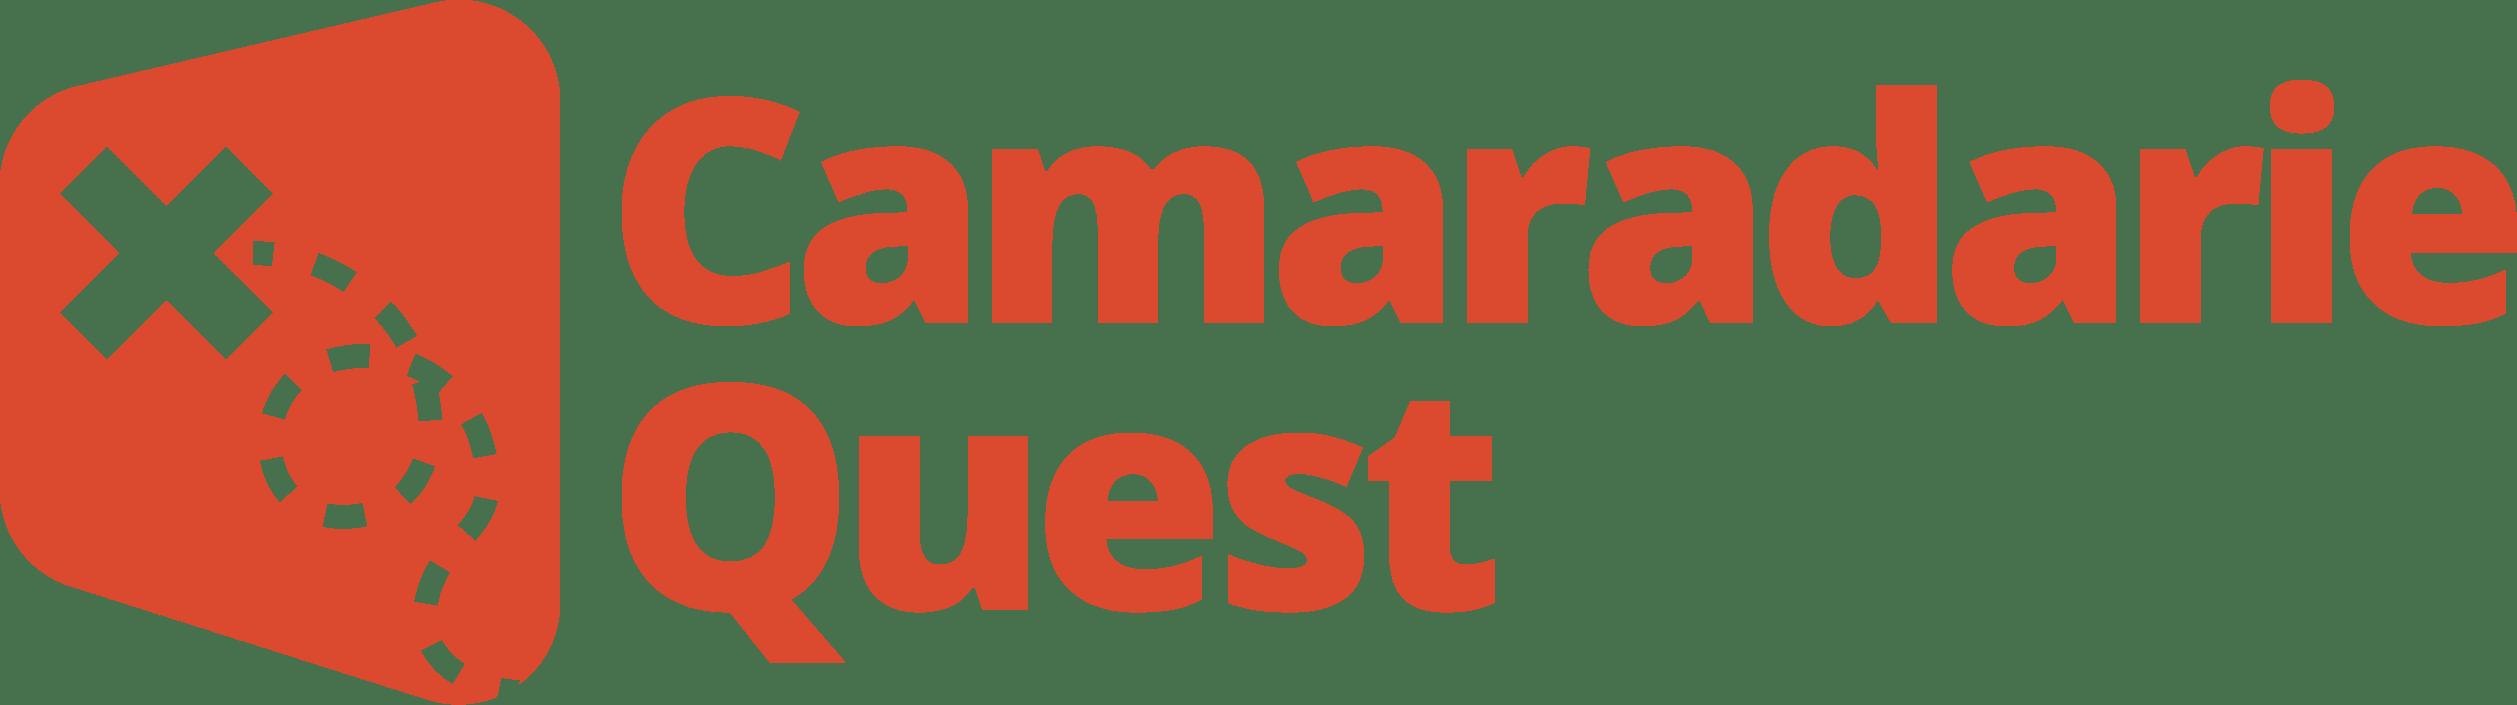 Camaraderie Quest Logo